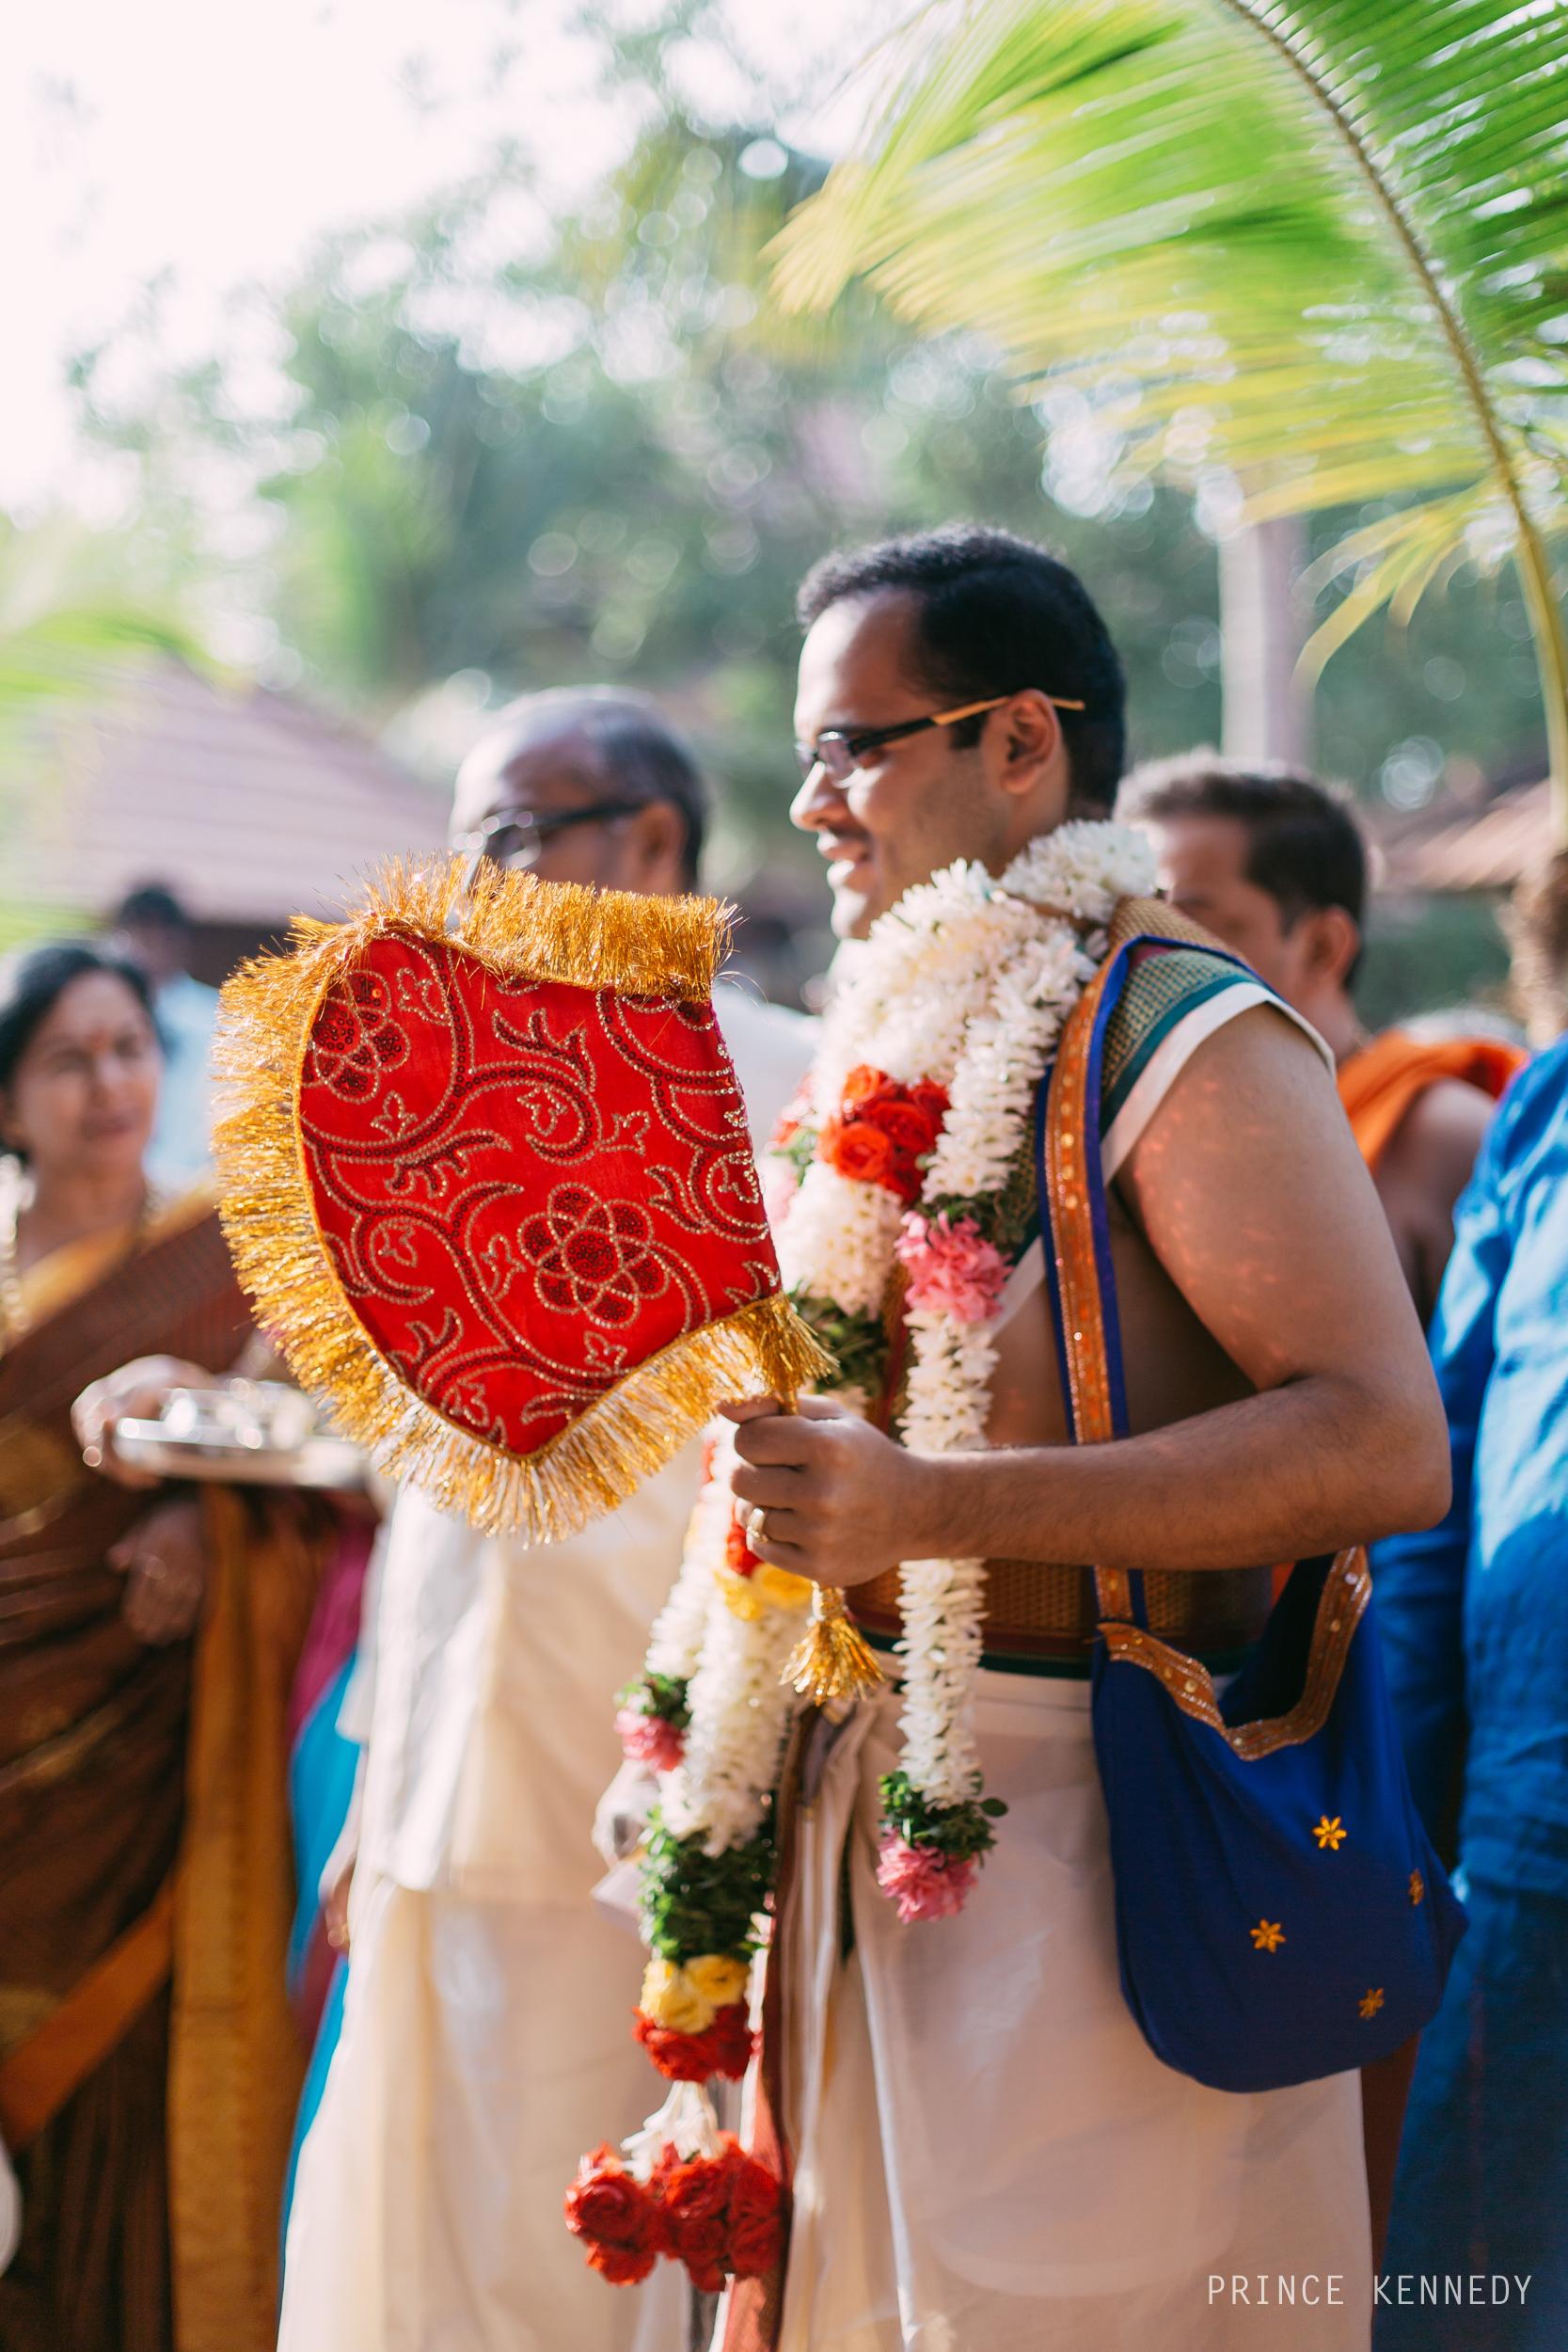 Athmajja-Nithesh-Engagement-Couple-Portrait-Portraiture-Wedding-Couple-Portrait-Chennai-Photographer-Candid-Photography-Destination-Best-Prince-Kennedy-Photography-42.jpg